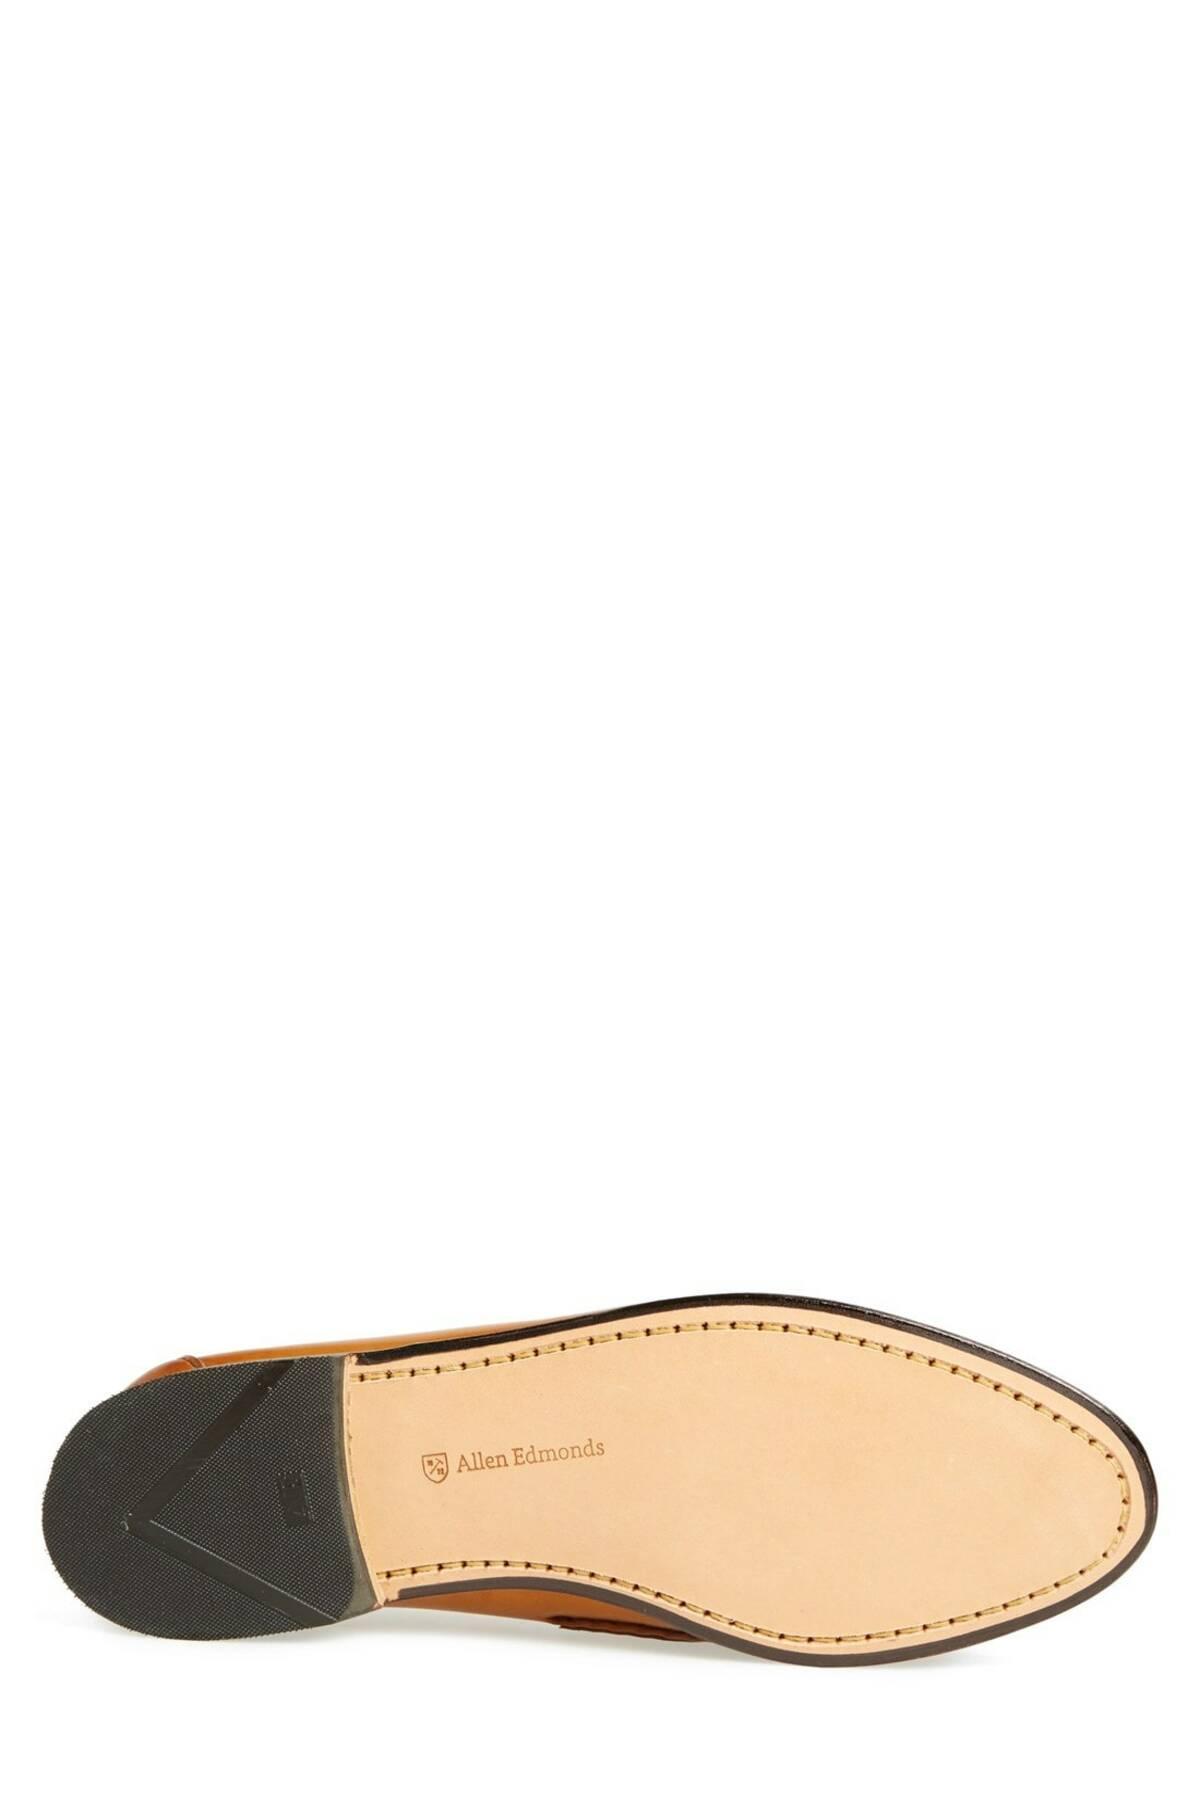 526377df28e Lyst - Allen Edmonds  cavanaugh  Penny Loafer in Brown for Men